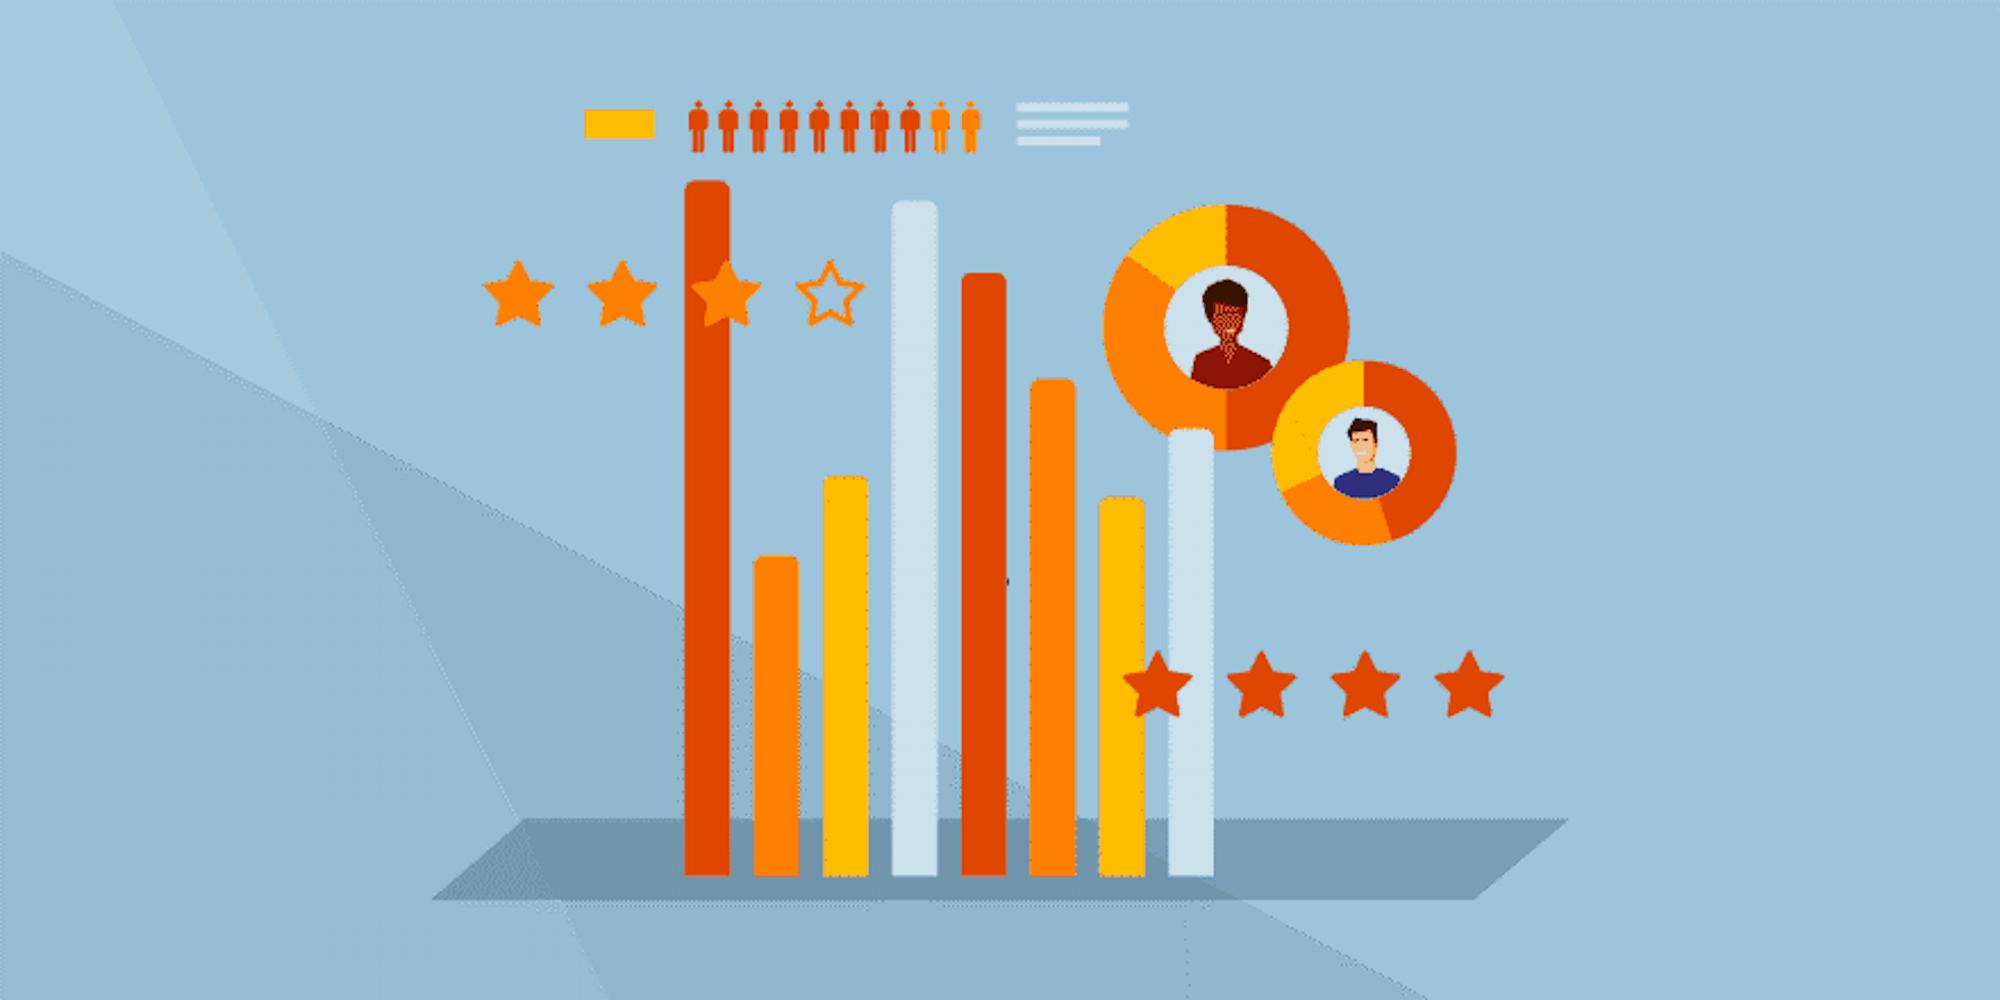 Kundenfeedback Graphik